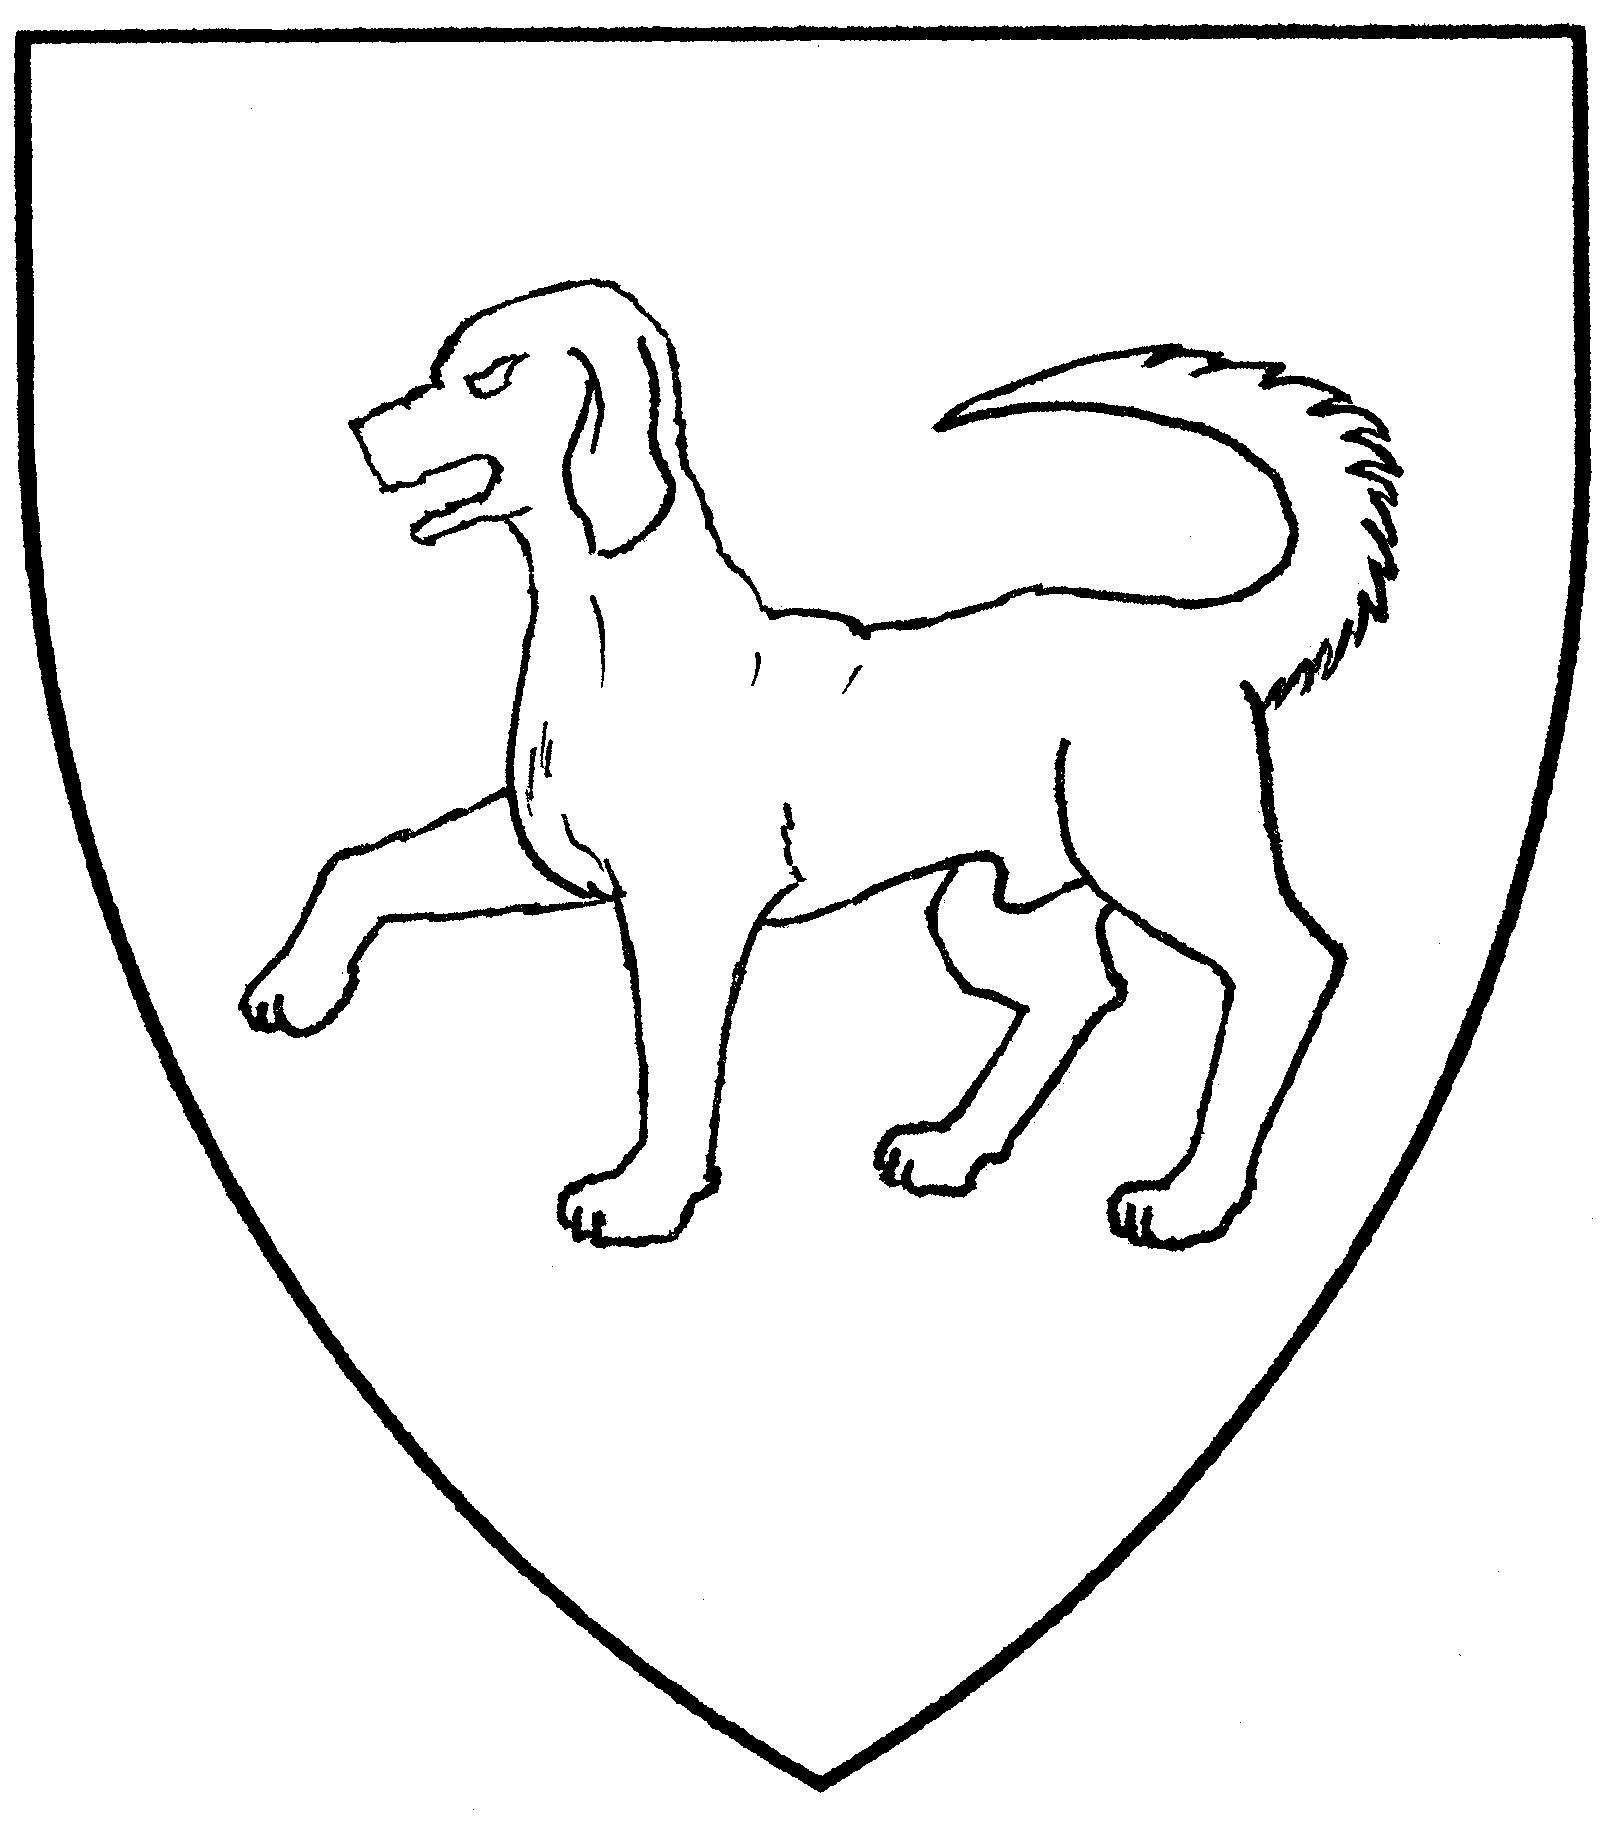 How to breed heraldic dragon - Dog